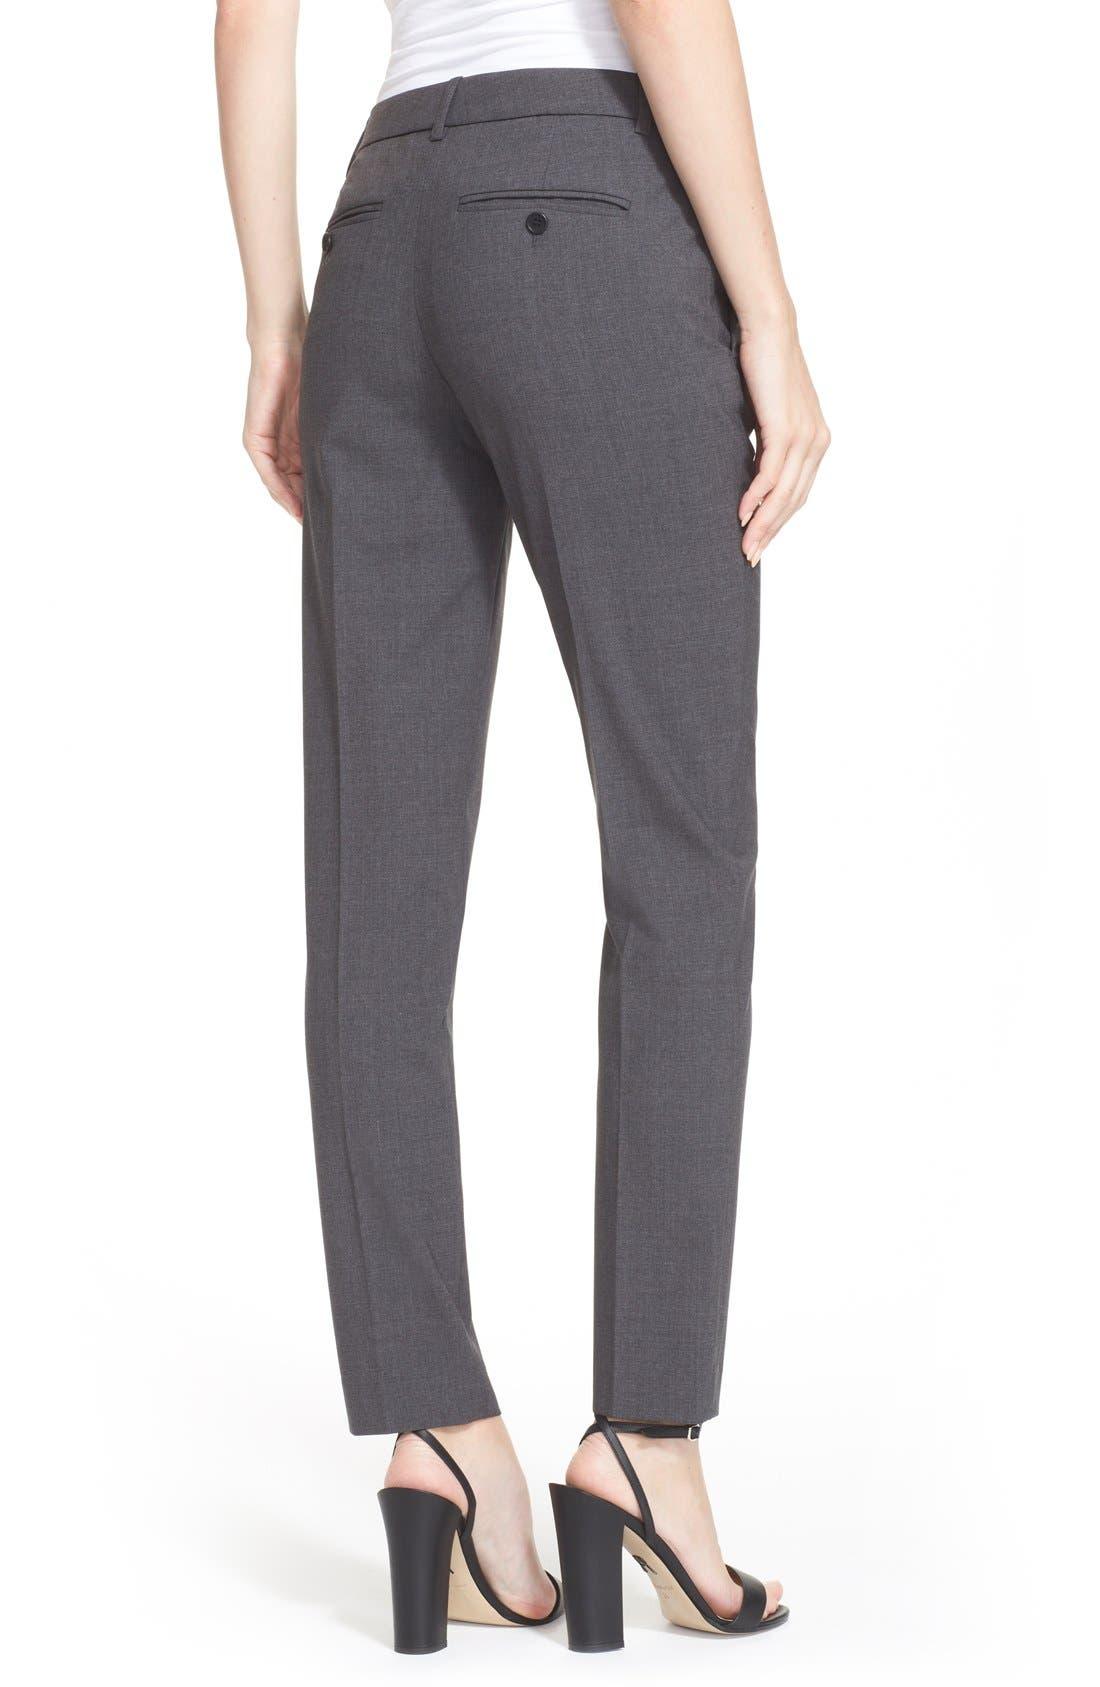 Testra 2B Stretch Wool Pants,                             Alternate thumbnail 2, color,                             020